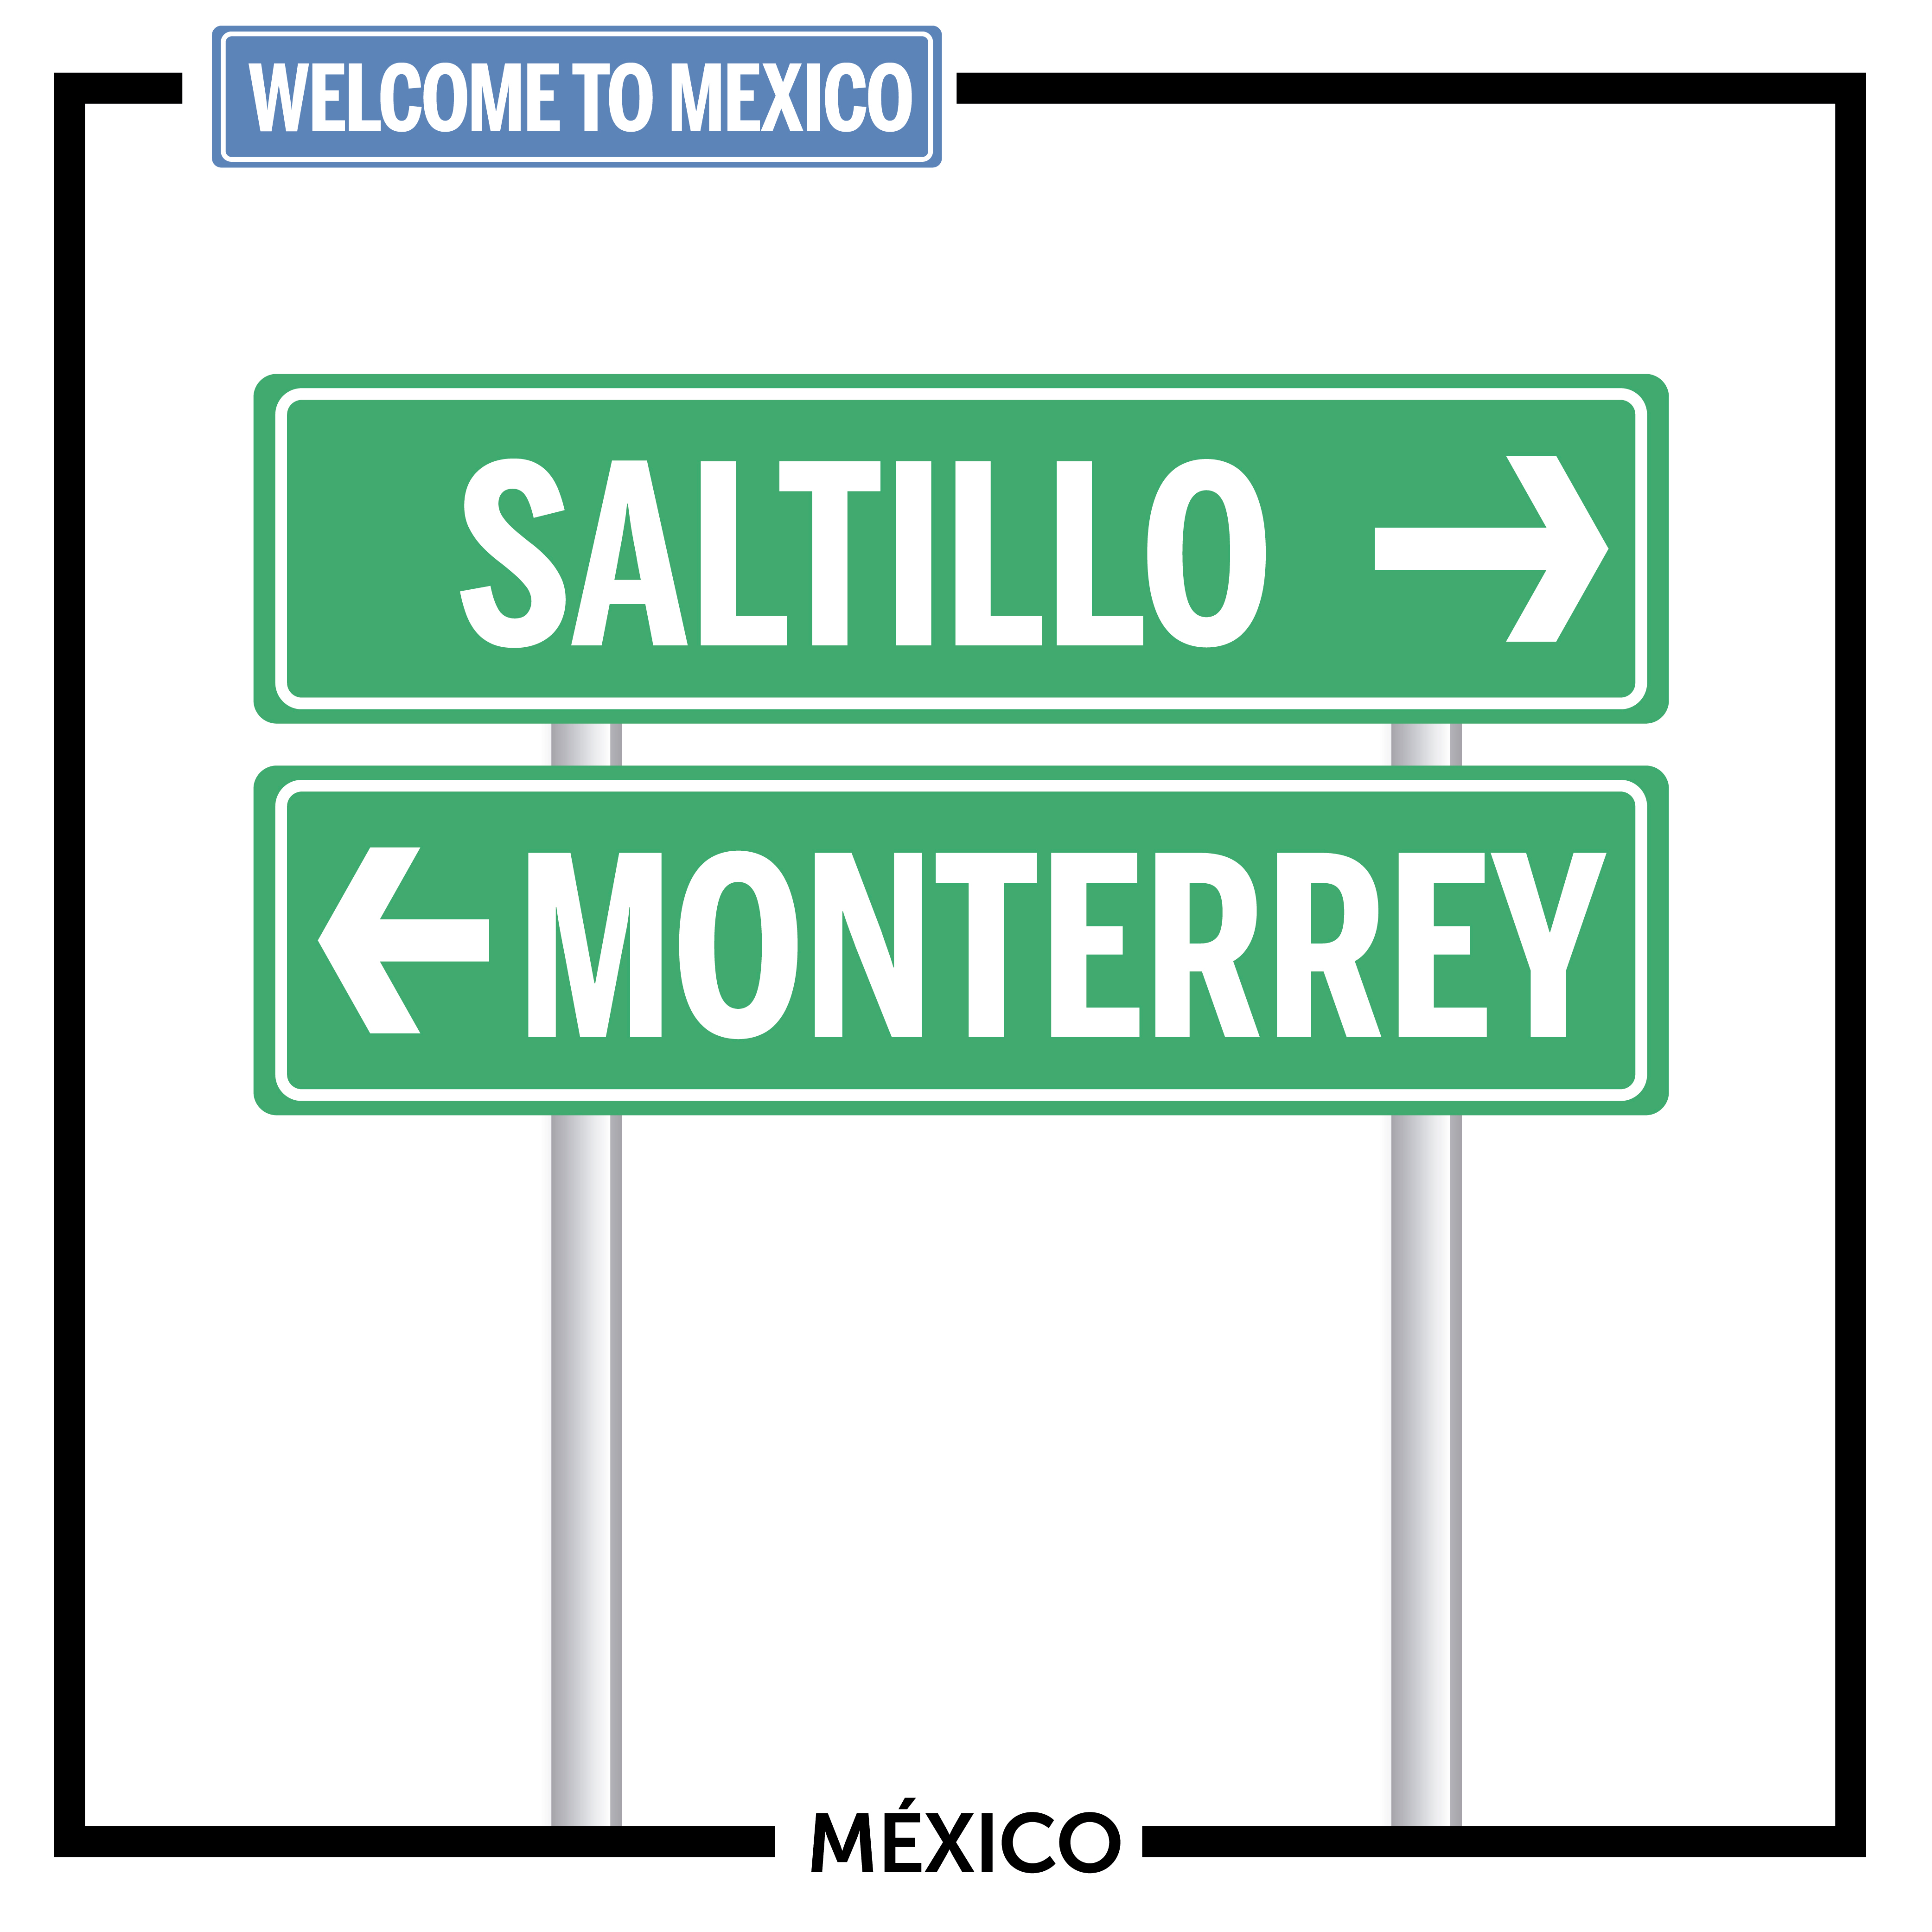 Manufacturing in Saltillo vs Monterrey?